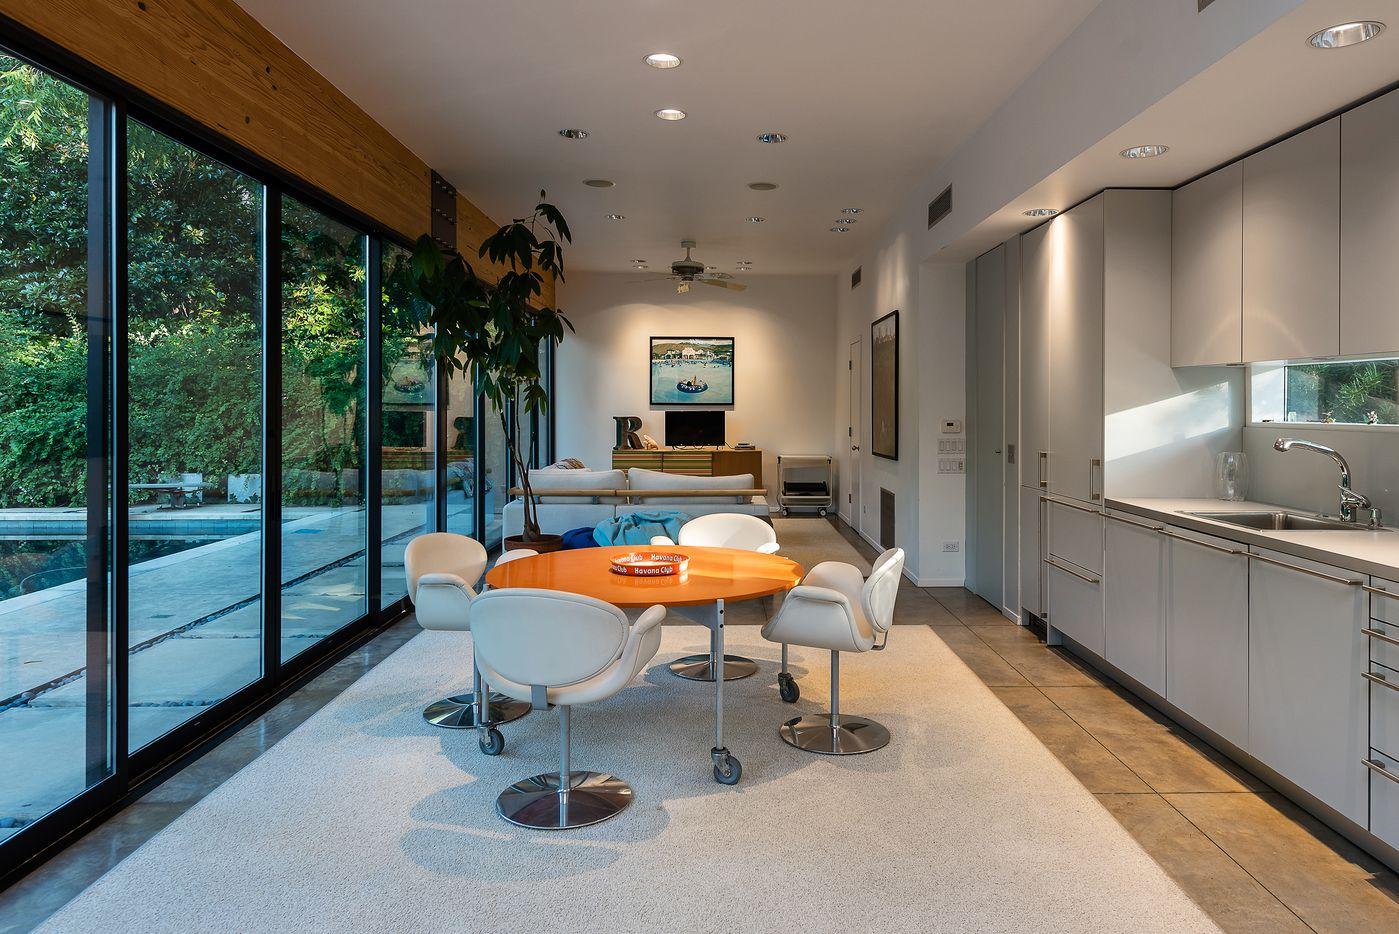 A look at the property at 5036 Seneca Drive in Dallas.